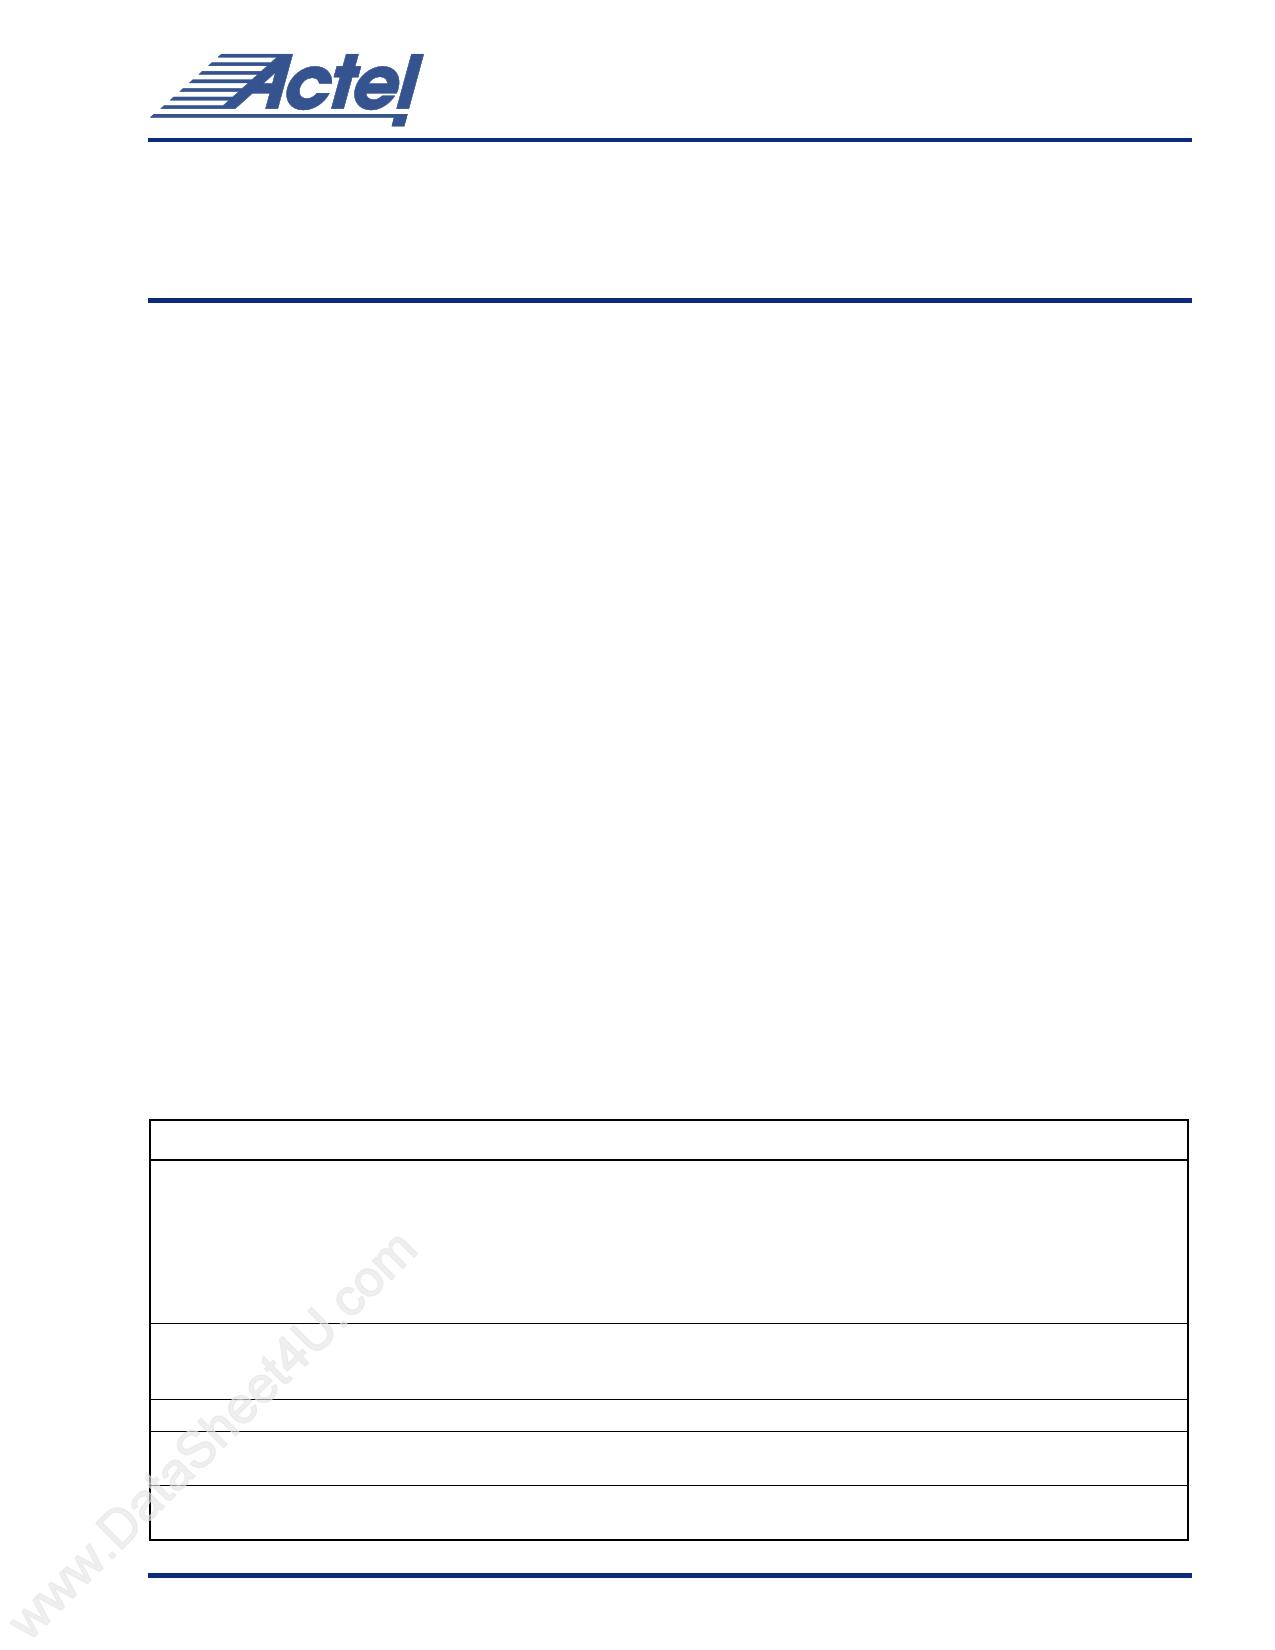 A1020B datasheet, circuit